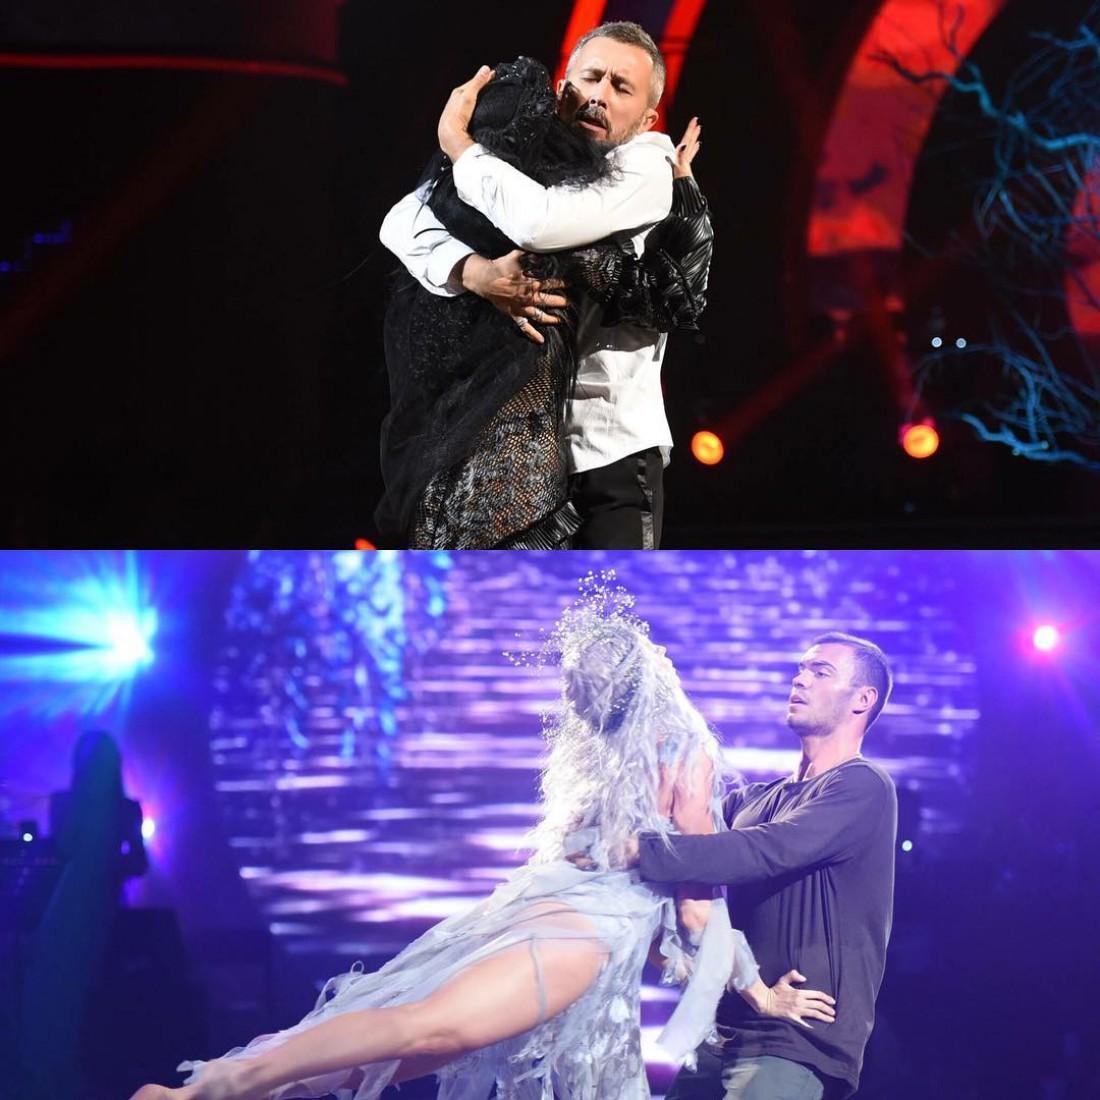 Танці з зірками 2017: Снежана и Сергей Бабкины, Оля Полякова и Степан Мисюрка